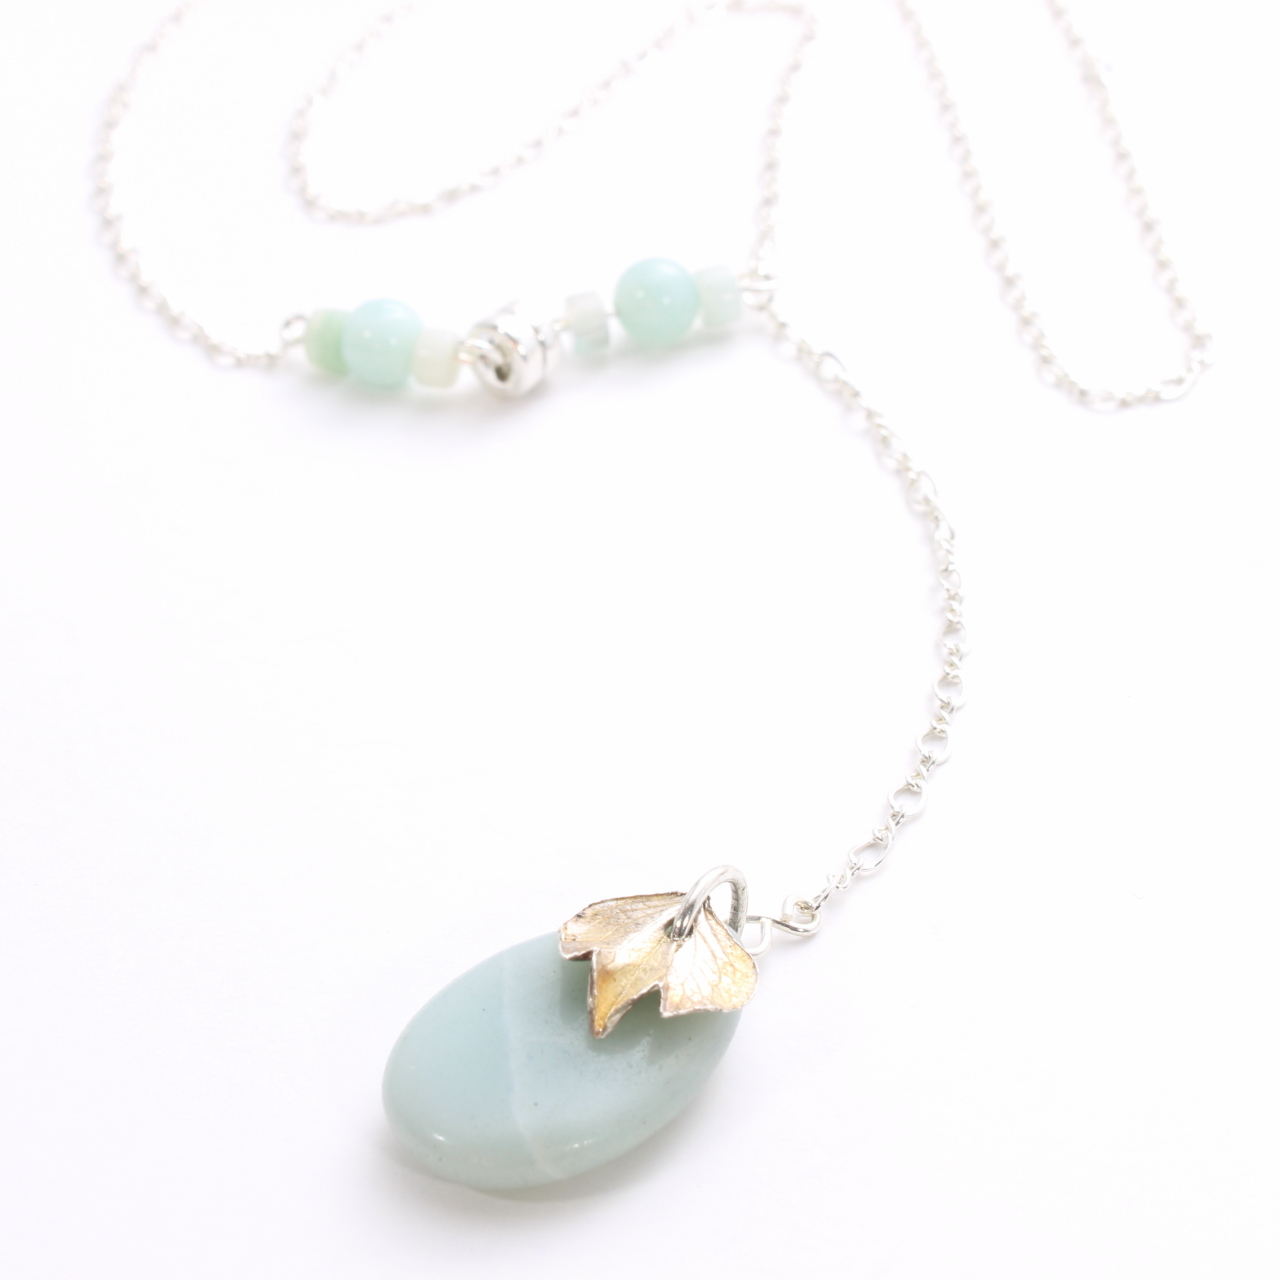 hydrangea-flower-petal-y-necklace-with-amazonite-teardrop-pendant